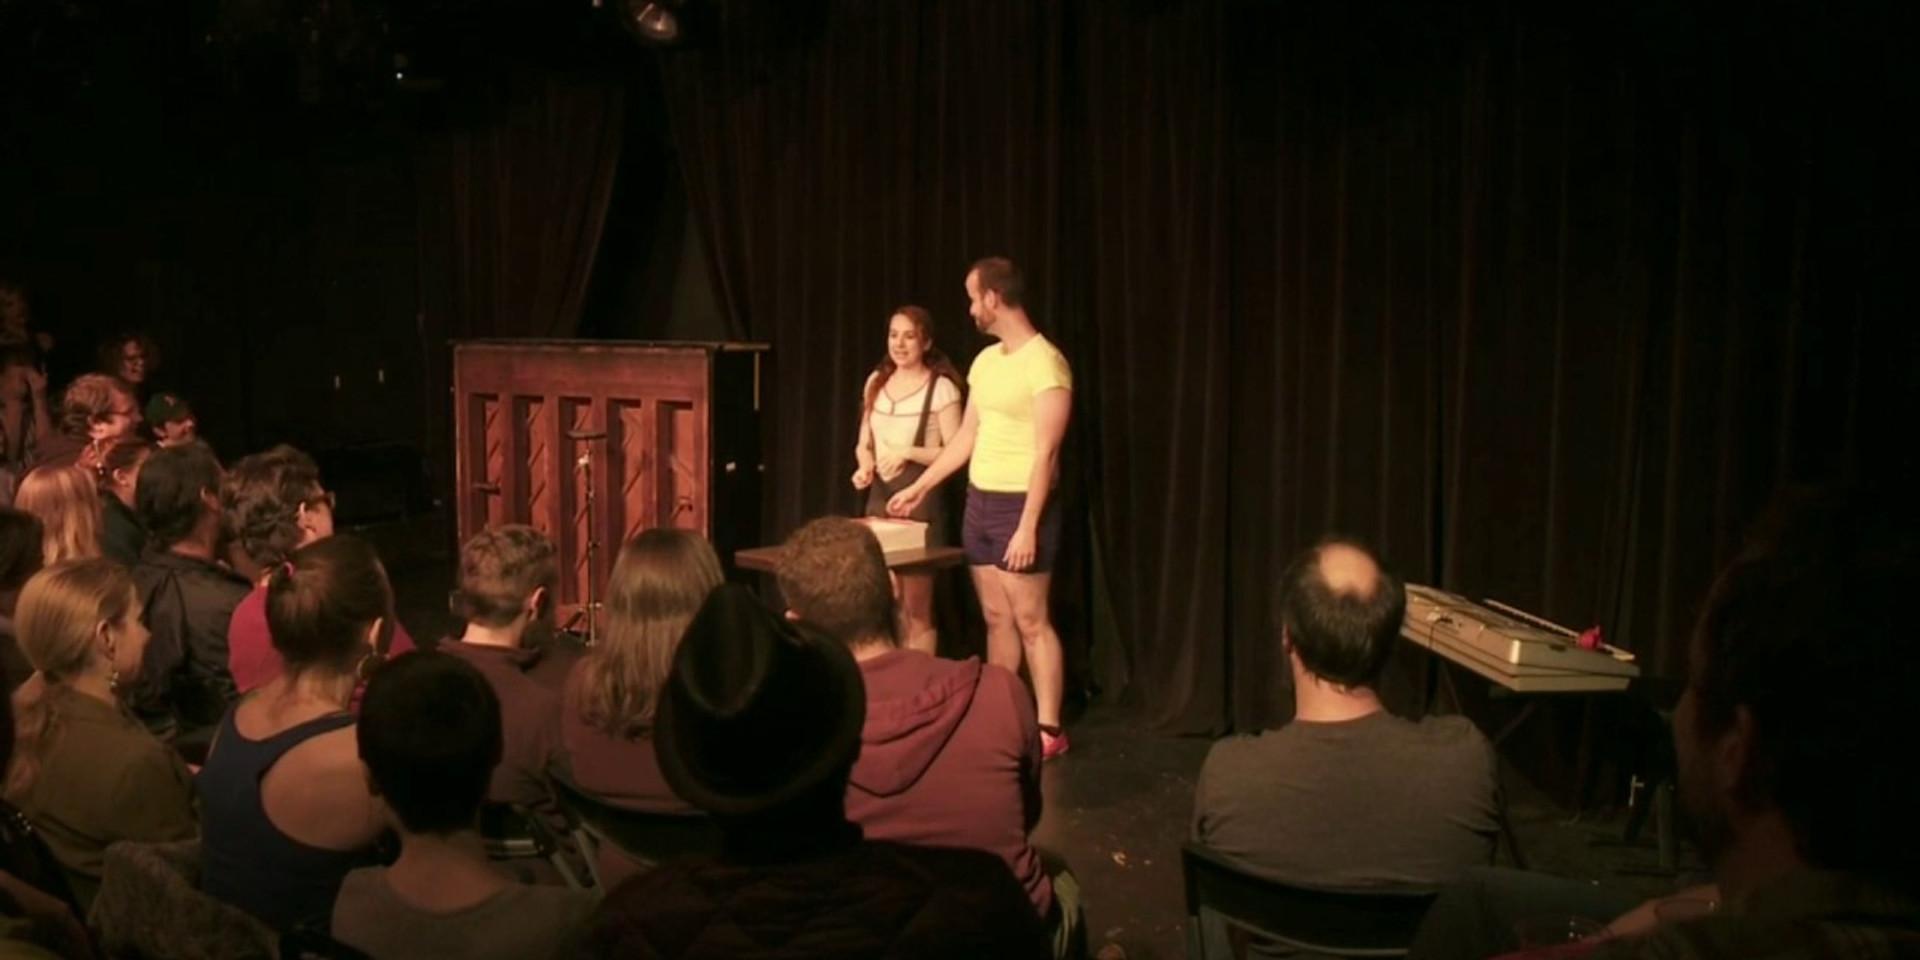 Spencer & Lil' Joel: Clown- Comedy- Best Friend- Chipmunk in your pocket